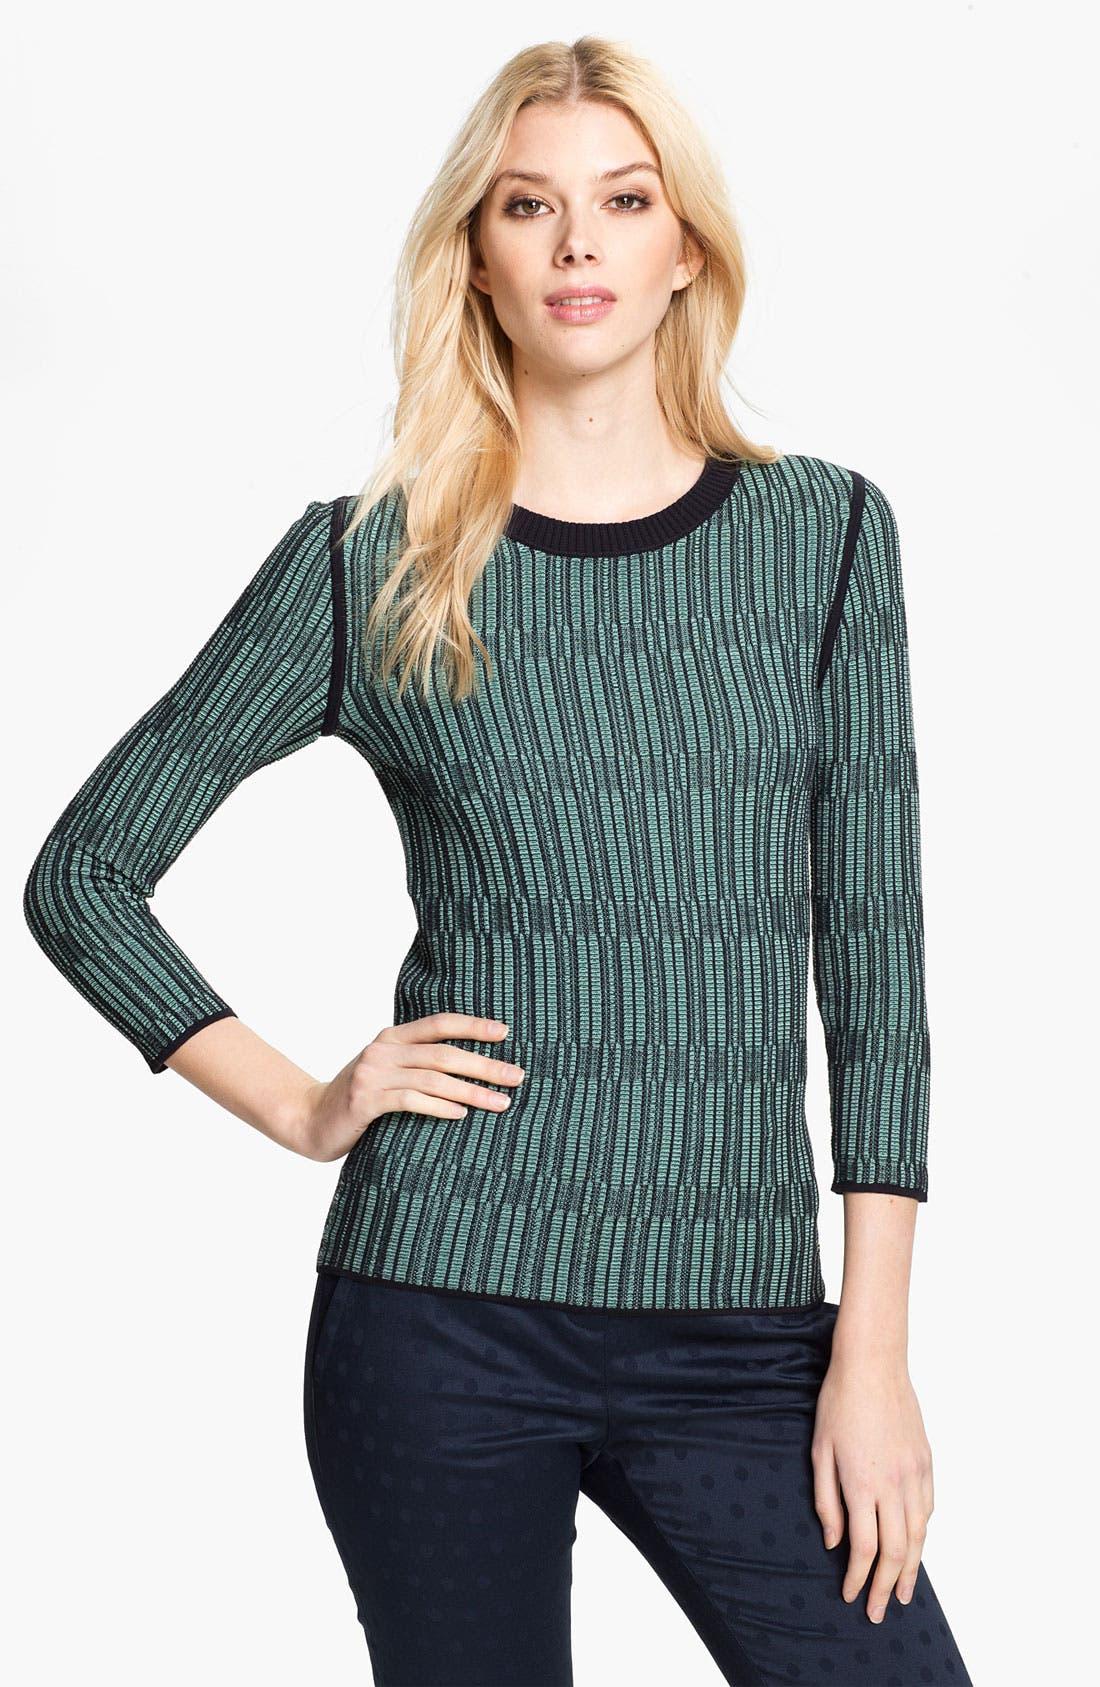 Main Image - Tory Burch 'Arielle' Sweater